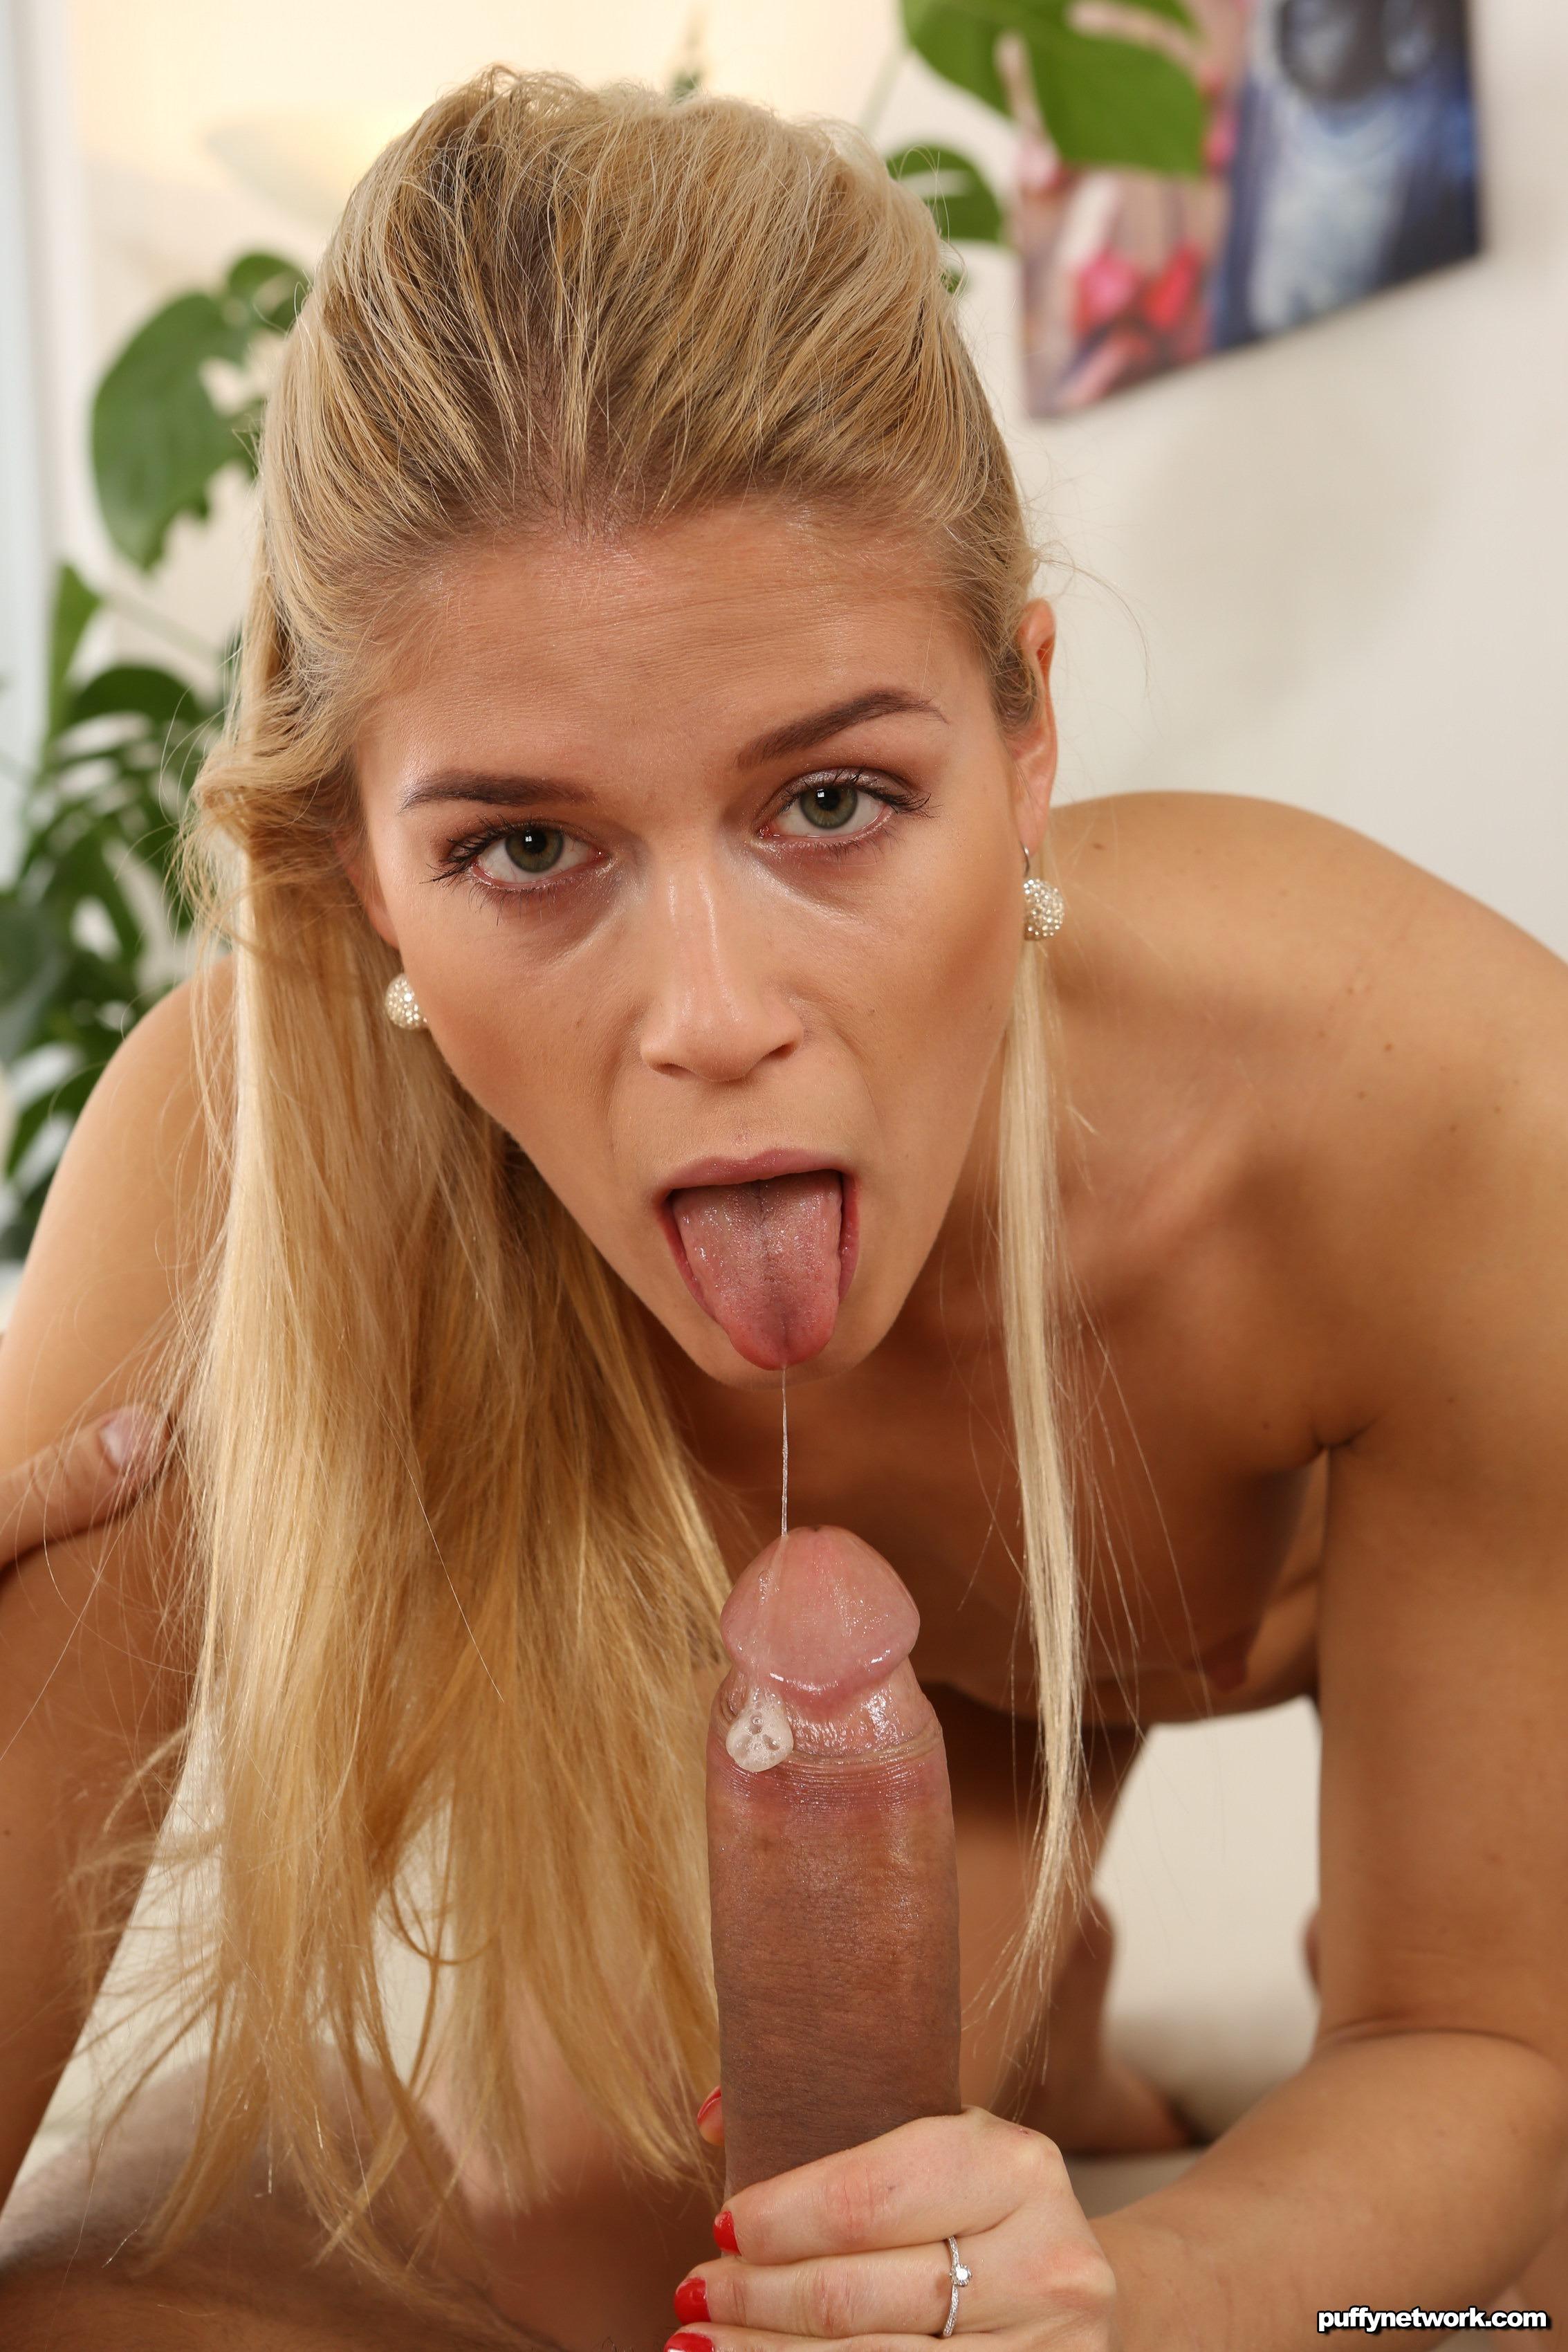 image Blonde babe sucks cock upside down